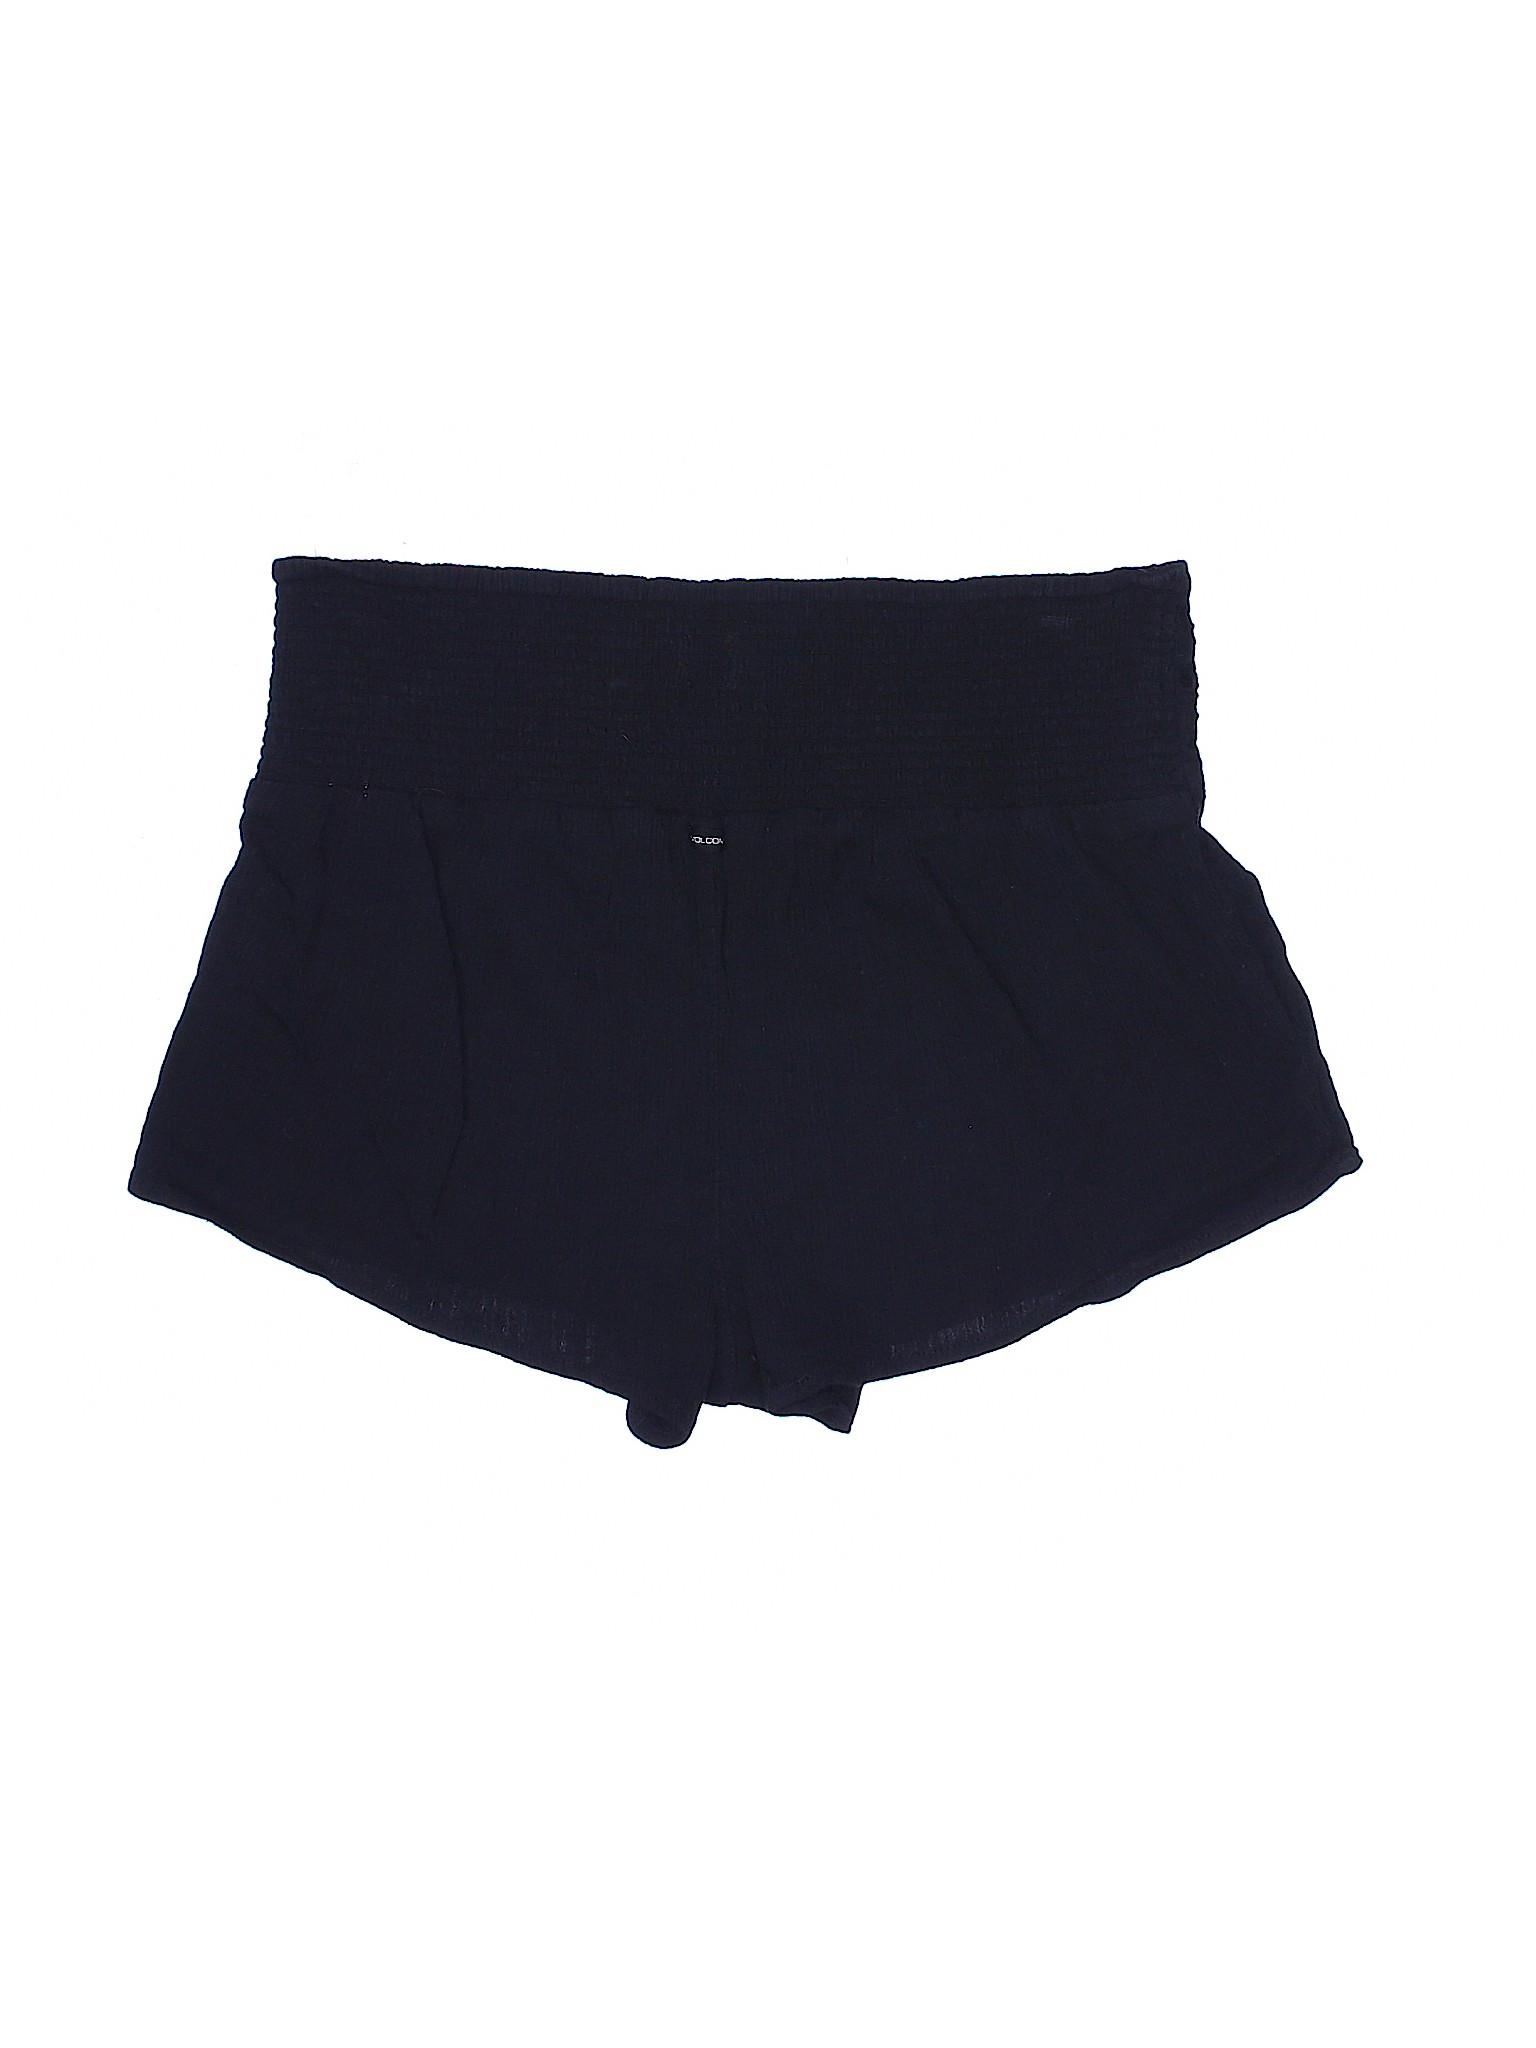 Shorts Boutique winter winter winter Volcom Boutique Boutique Shorts Volcom qwgpqSI